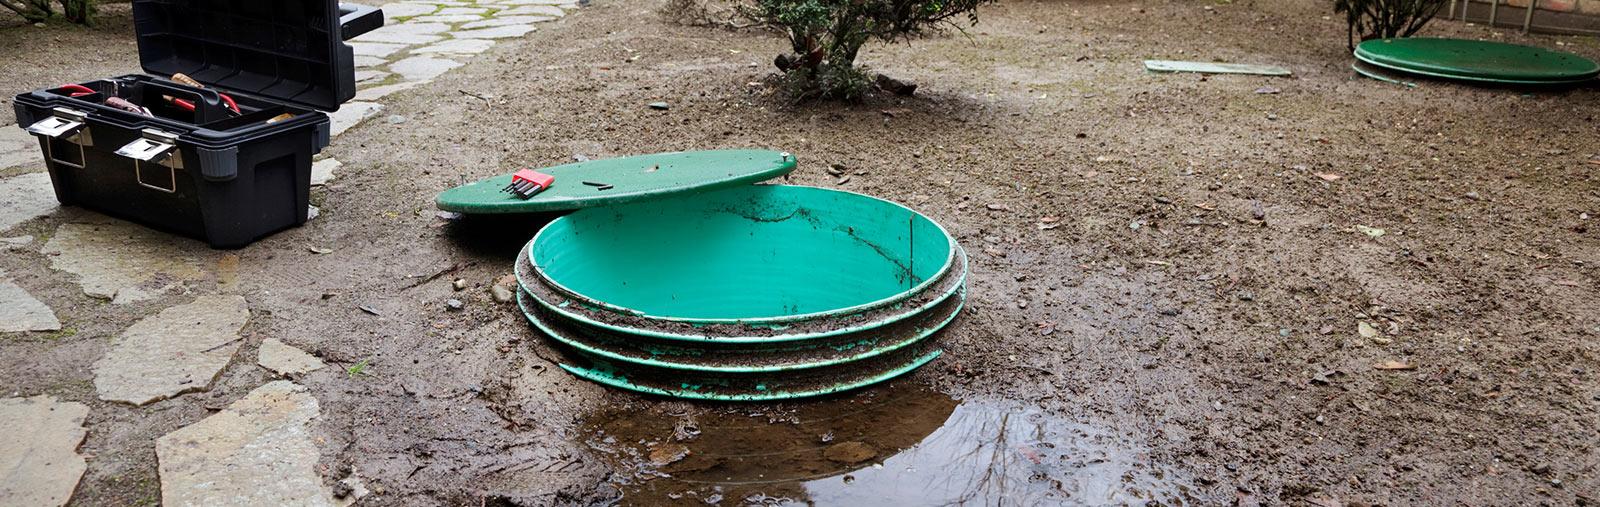 slide-sewage-noWater